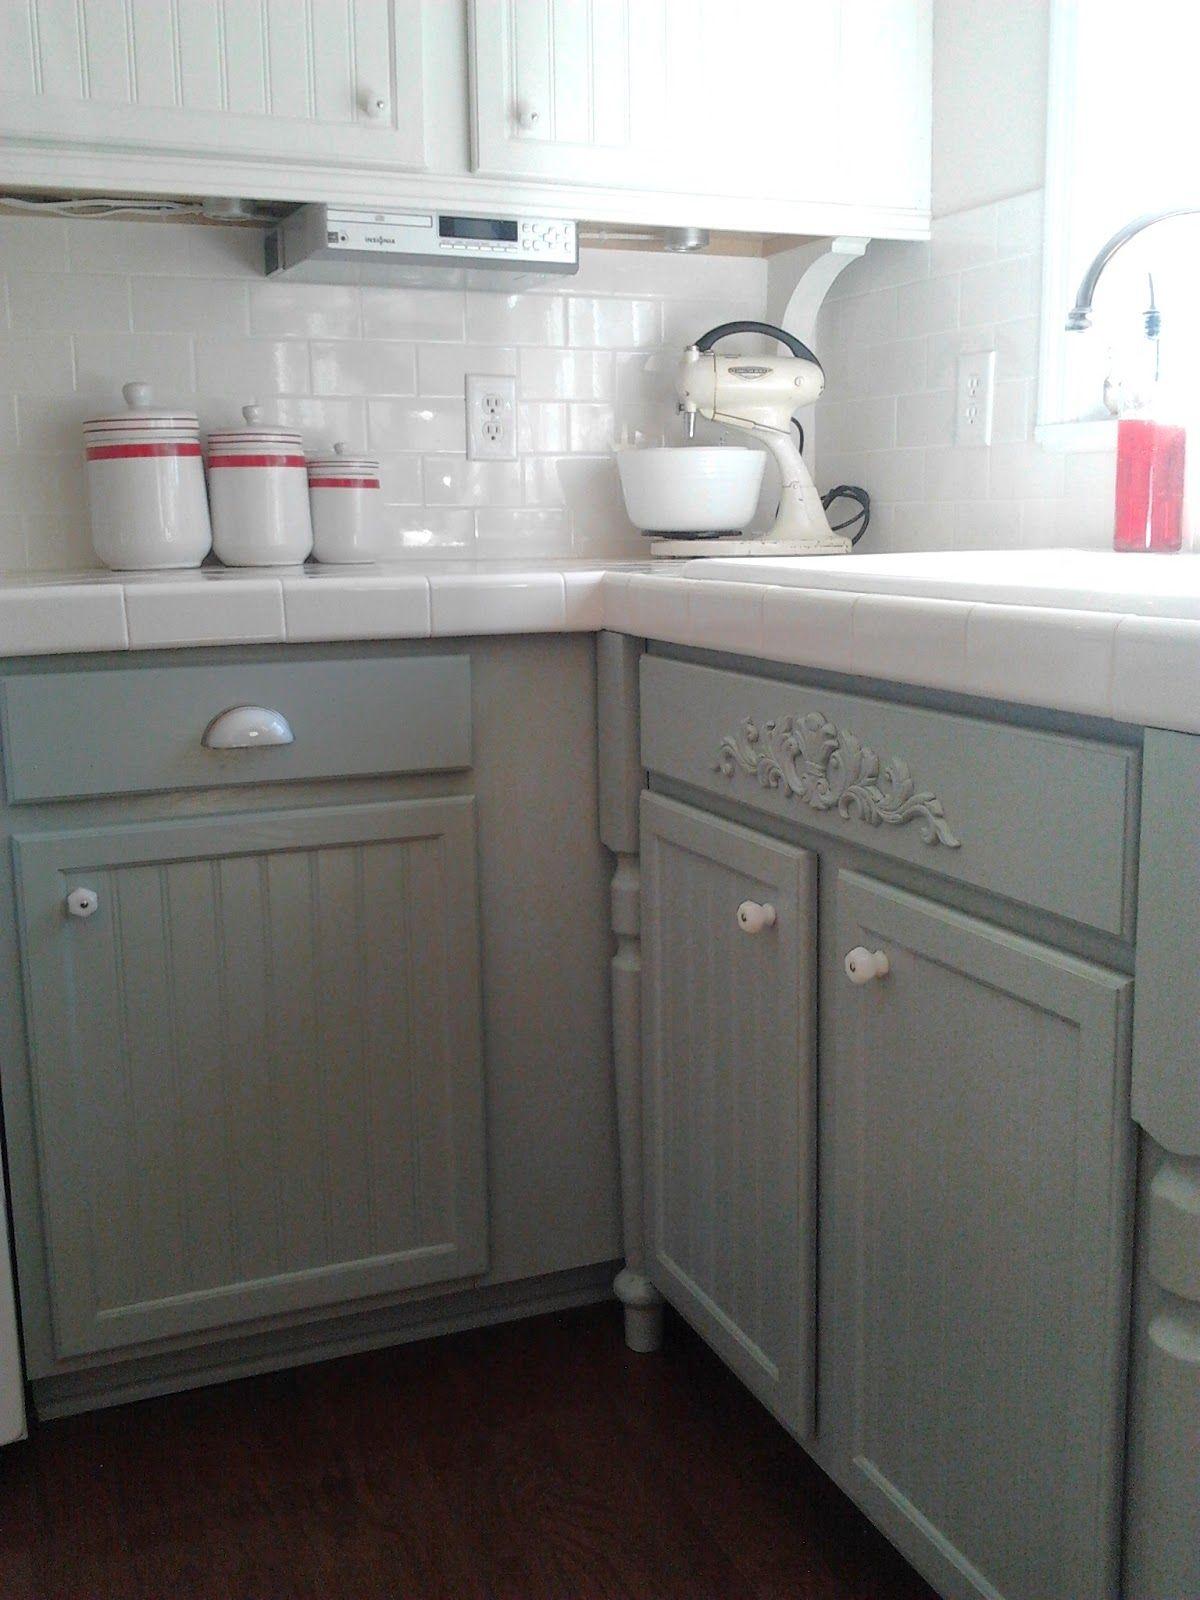 Gray and White Kitchen Makeover with Hexagon Tile Backsplash